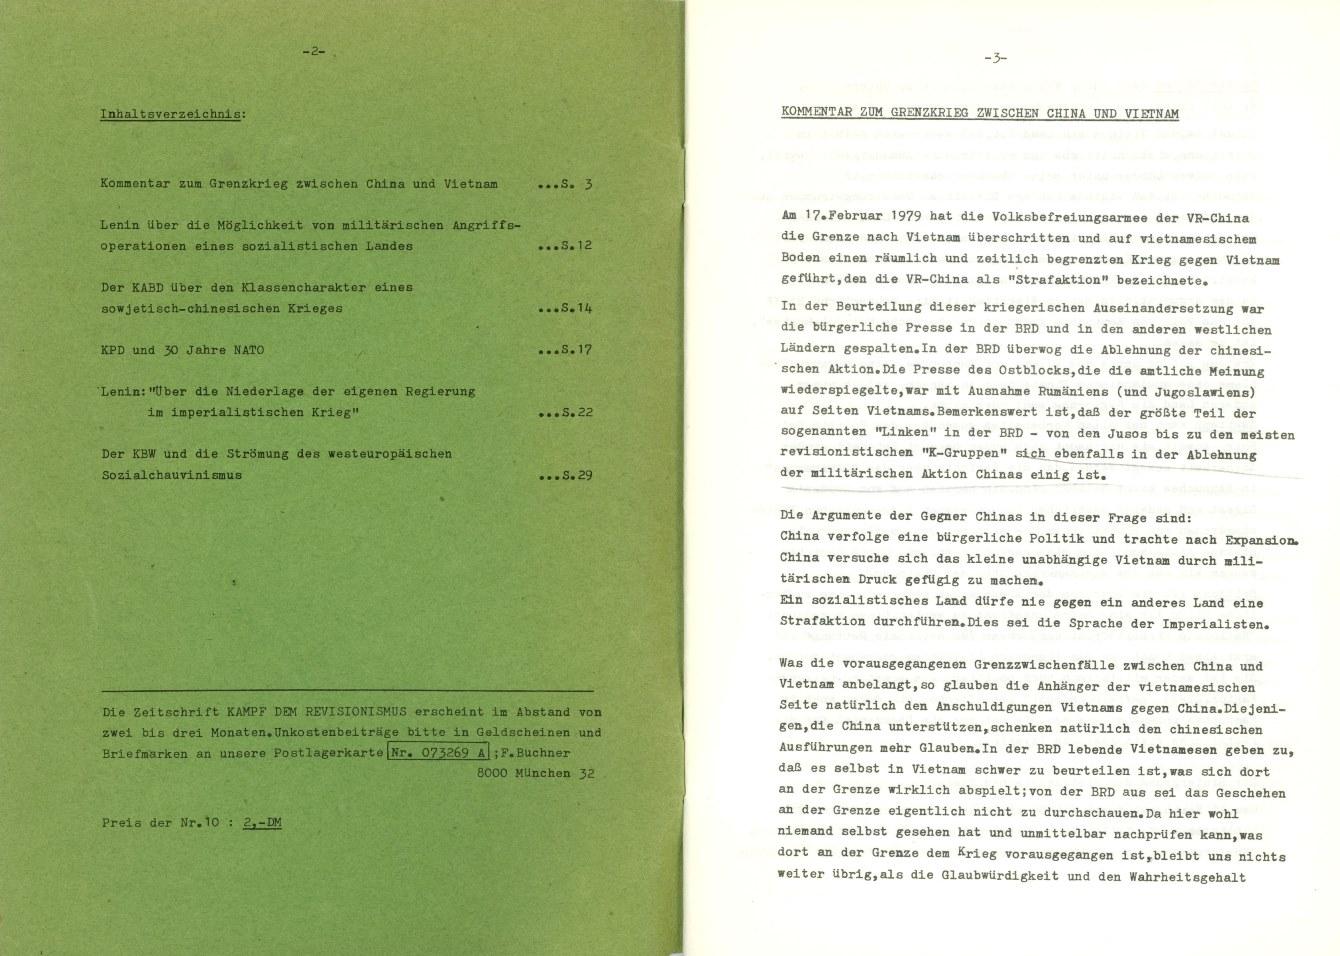 Muenchen_Kampf_dem_Revisionismus_1979_10_02